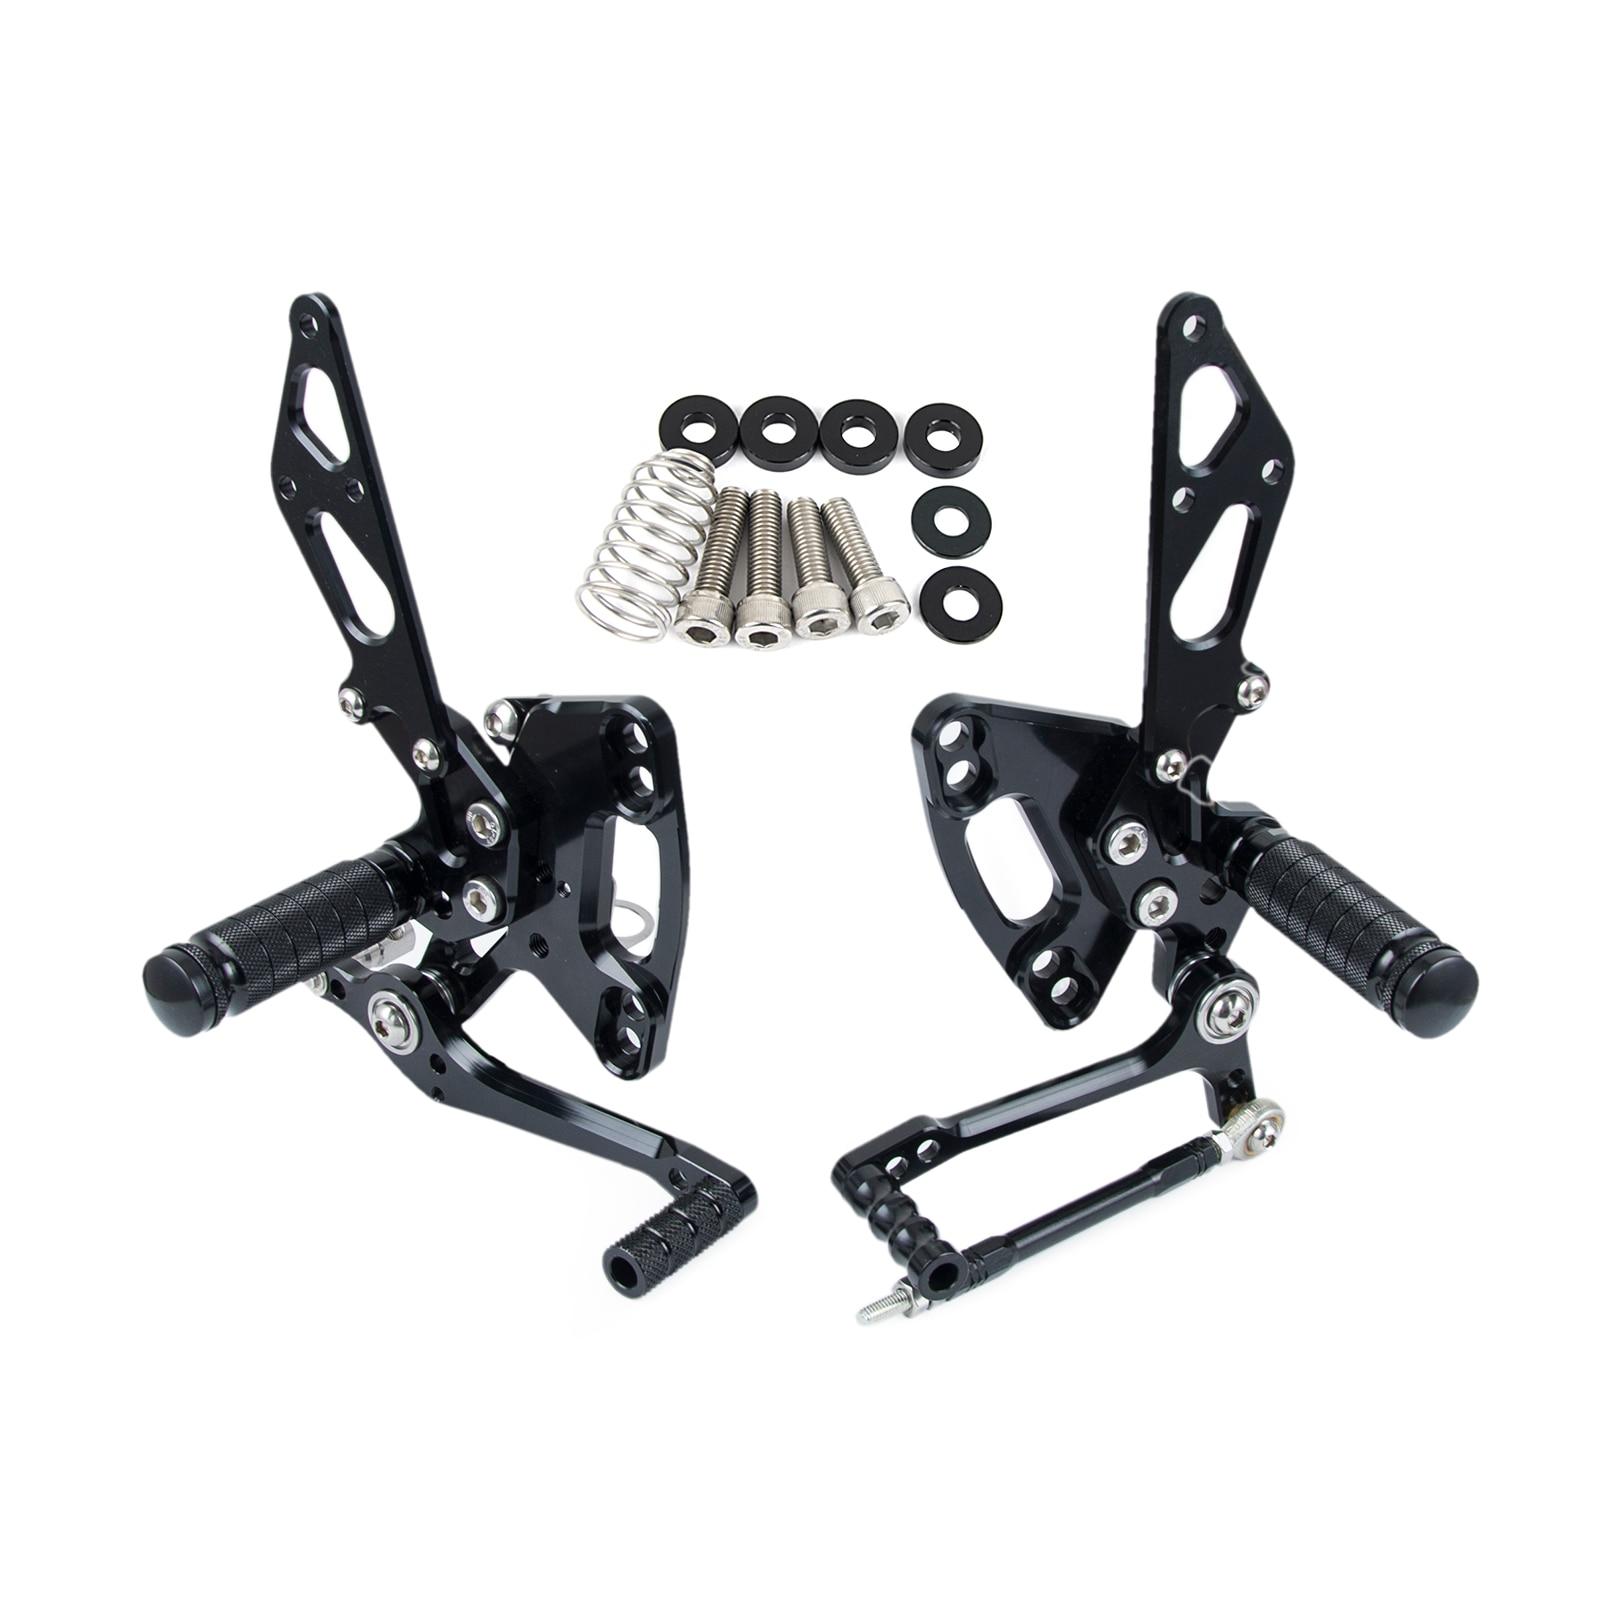 New Arrived CNC Adjustable Foot pegs Rearset Footrests Rear Sets For Kawasaki Ninja 1000 /ABS Z1000/ABS Z1000SX  2011 2012 2013 titanium cnc aluminum racing adjustable rearset foot pegs rear sets for yamaha mt 07 fz 07 mt07 fz07 2013 2014 2015 2016